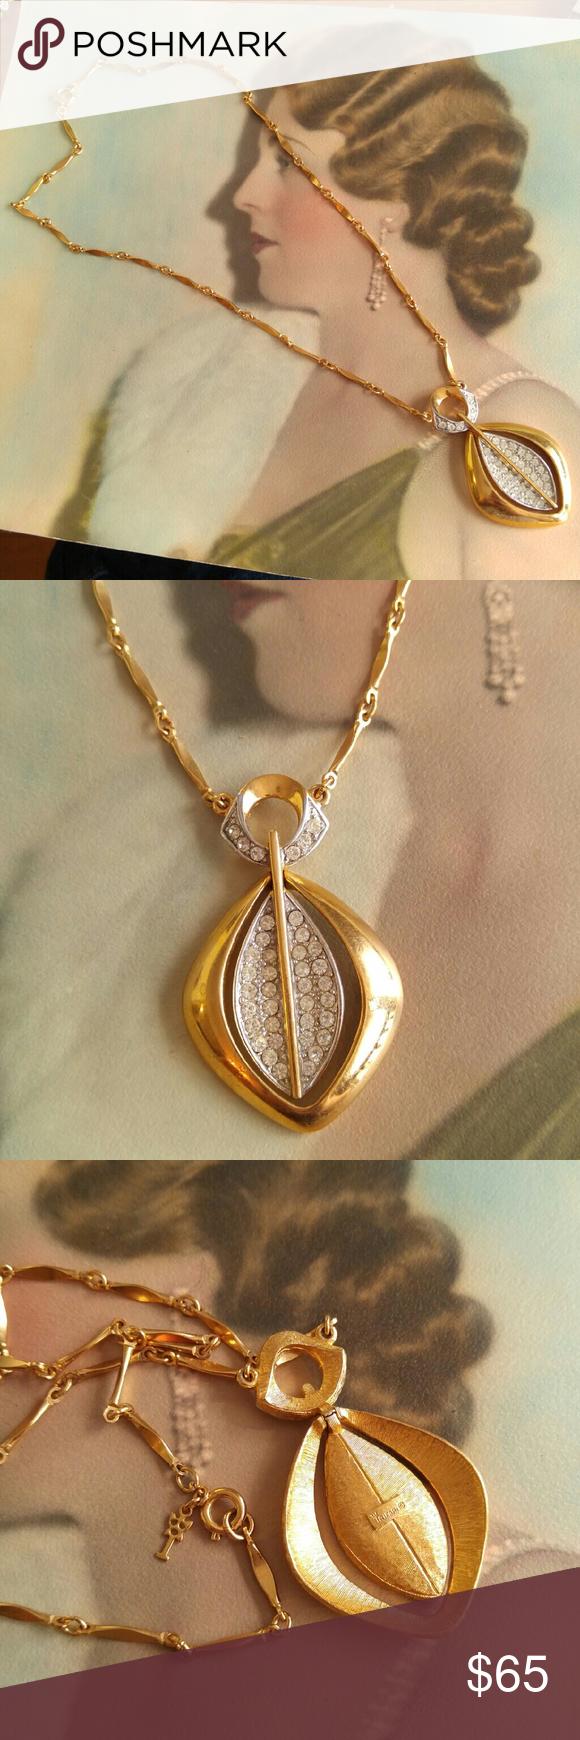 Vtg crown trifari necklace gold tone rhinestones design set smoke